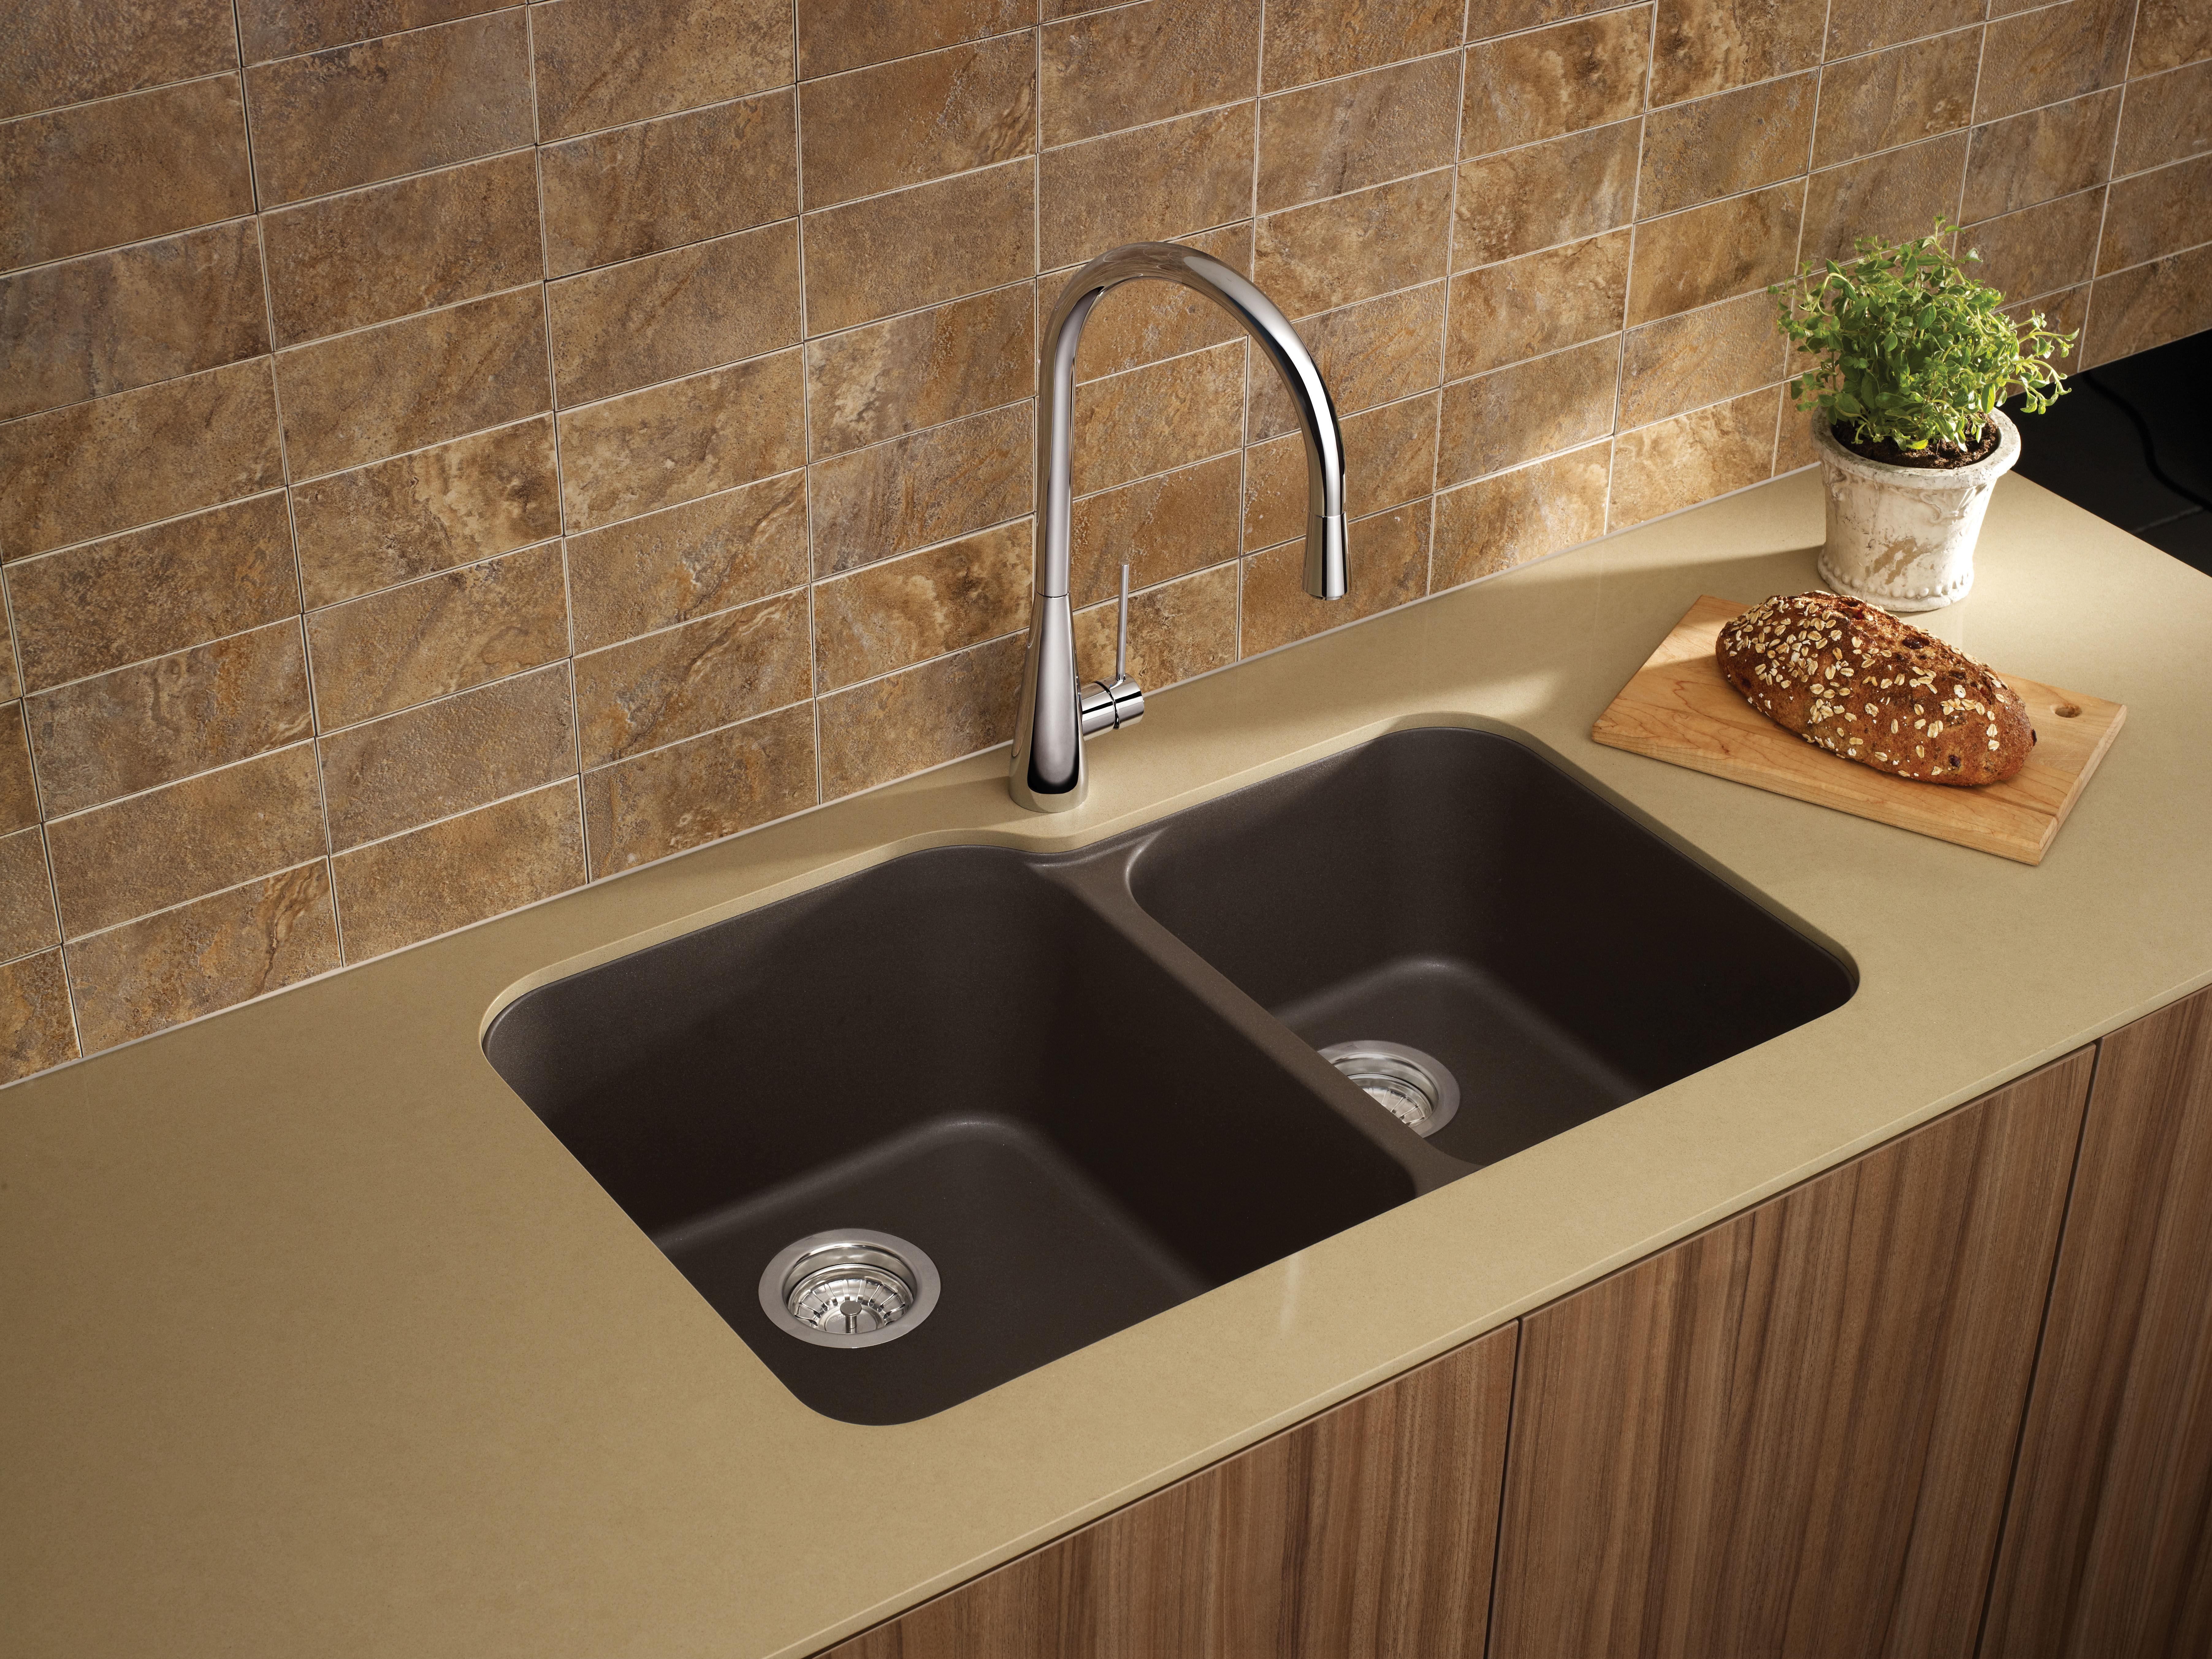 Blanco 446008 Anthracite Meridian Double Basin Undermount Silgranit Kitchen  Sink   Faucet.com